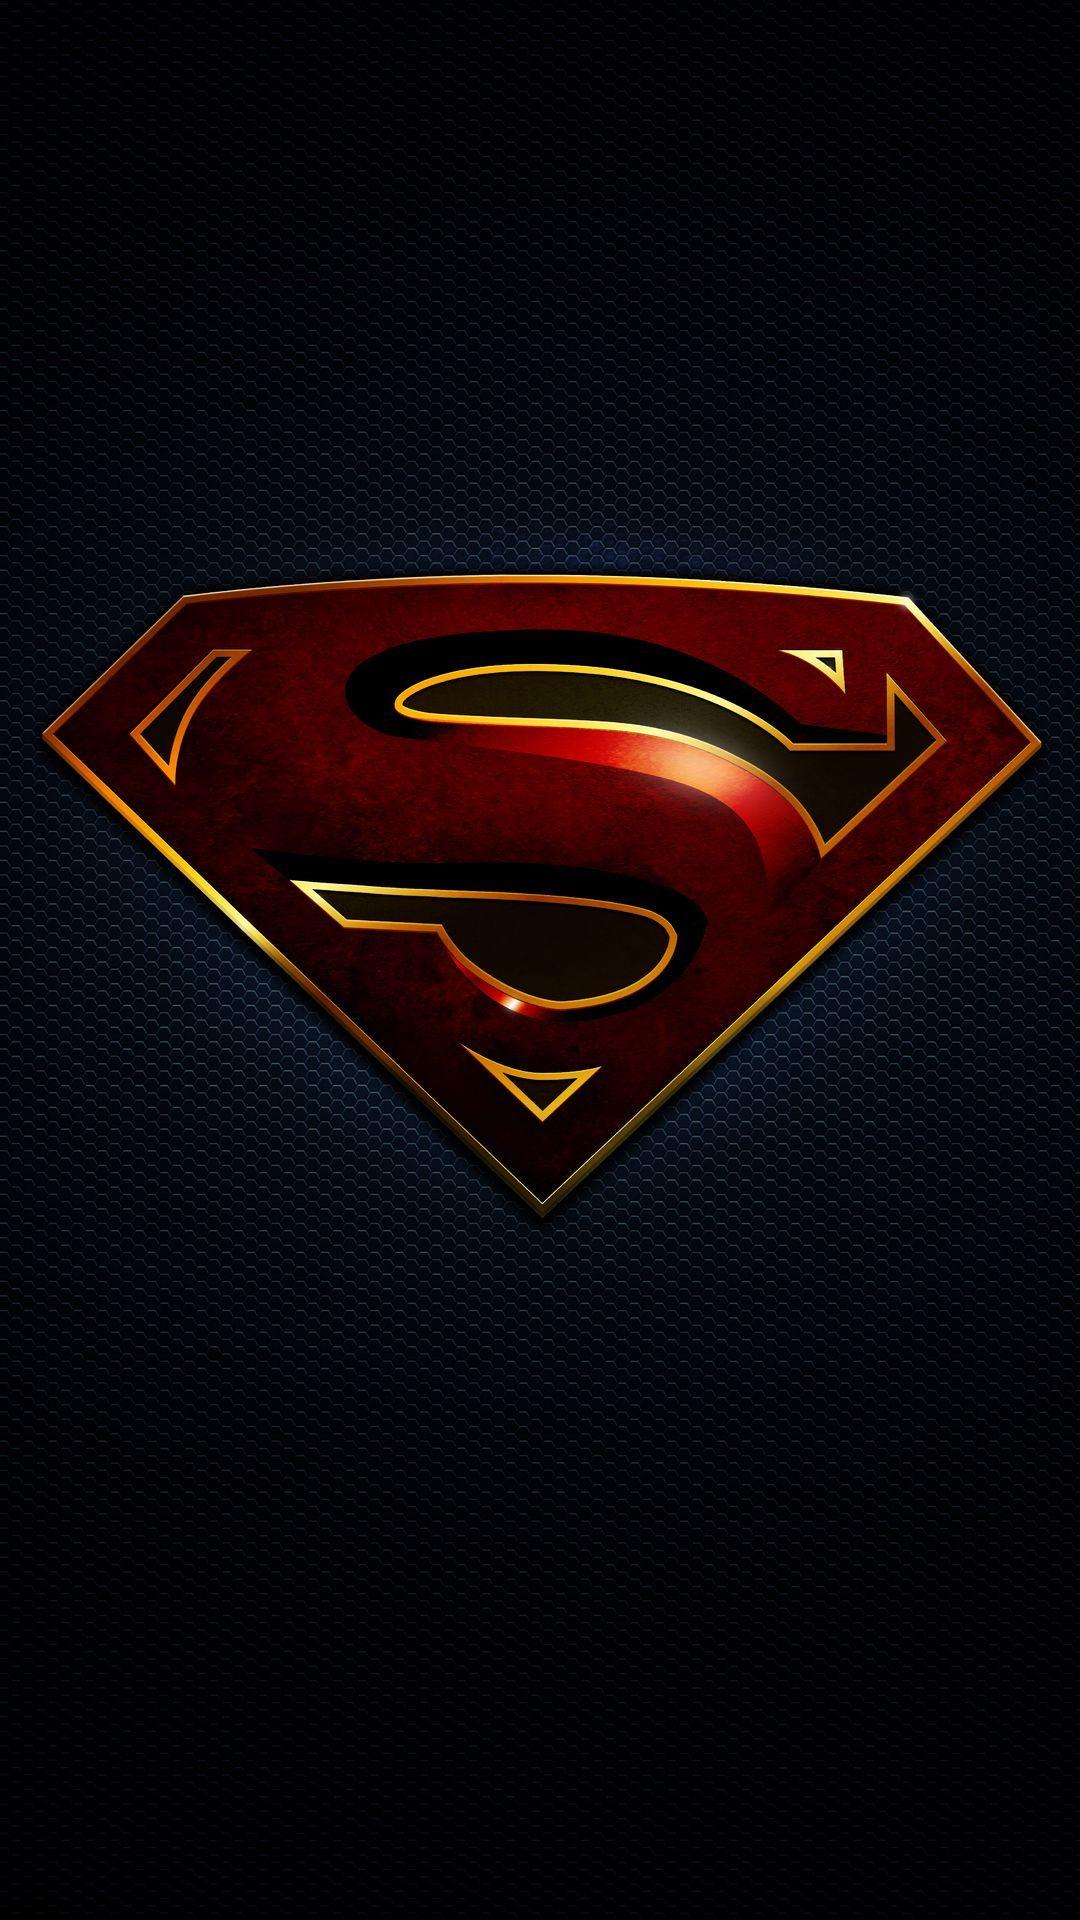 Wallpaper Superman Iphone X Superman Wallpaper Superman Wallpaper Logo Superhero Wallpaper Iphone